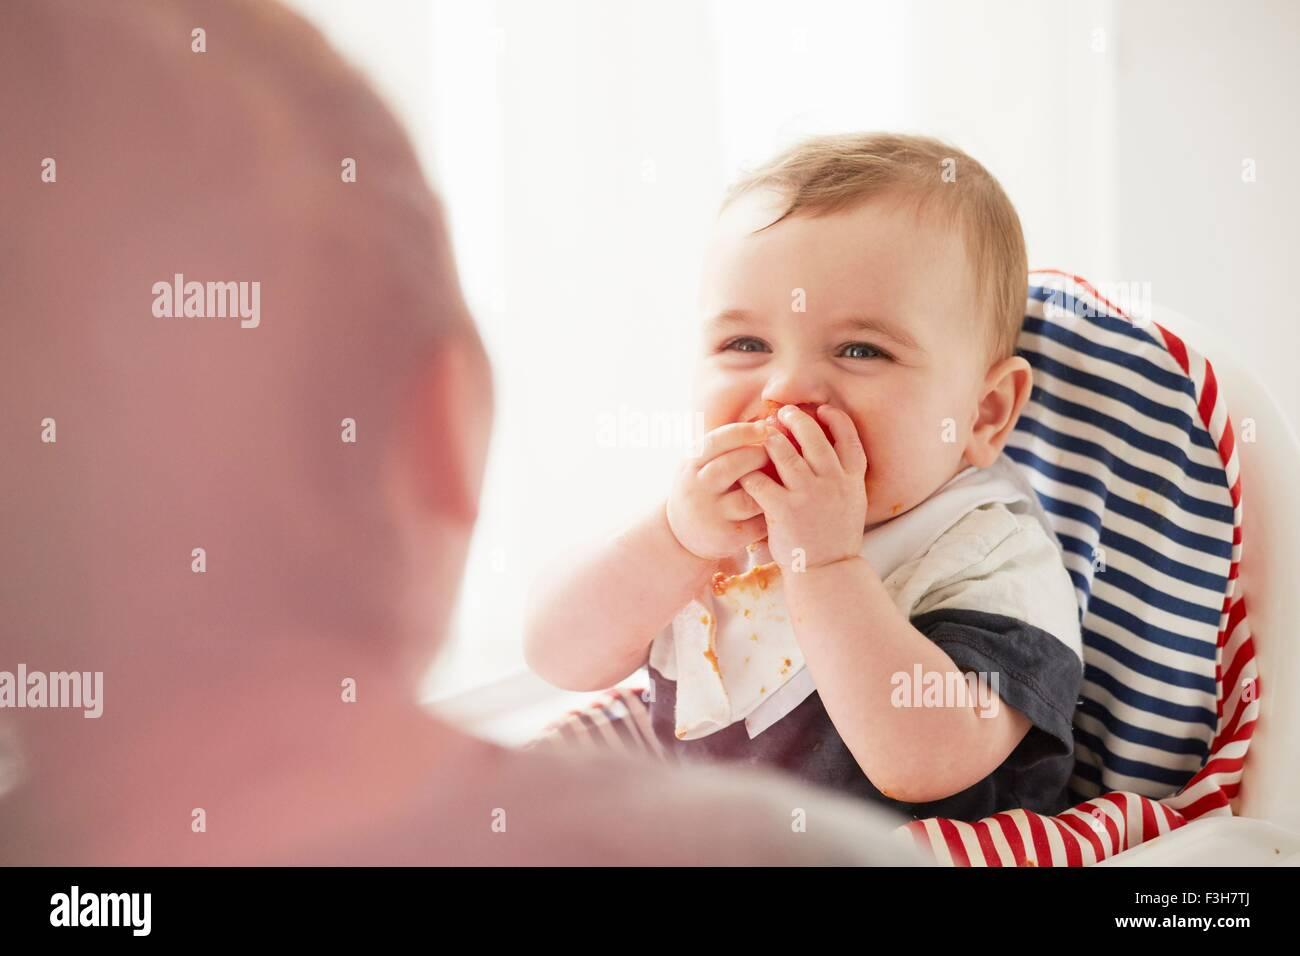 Baby Boy Fütterung selbst in Baby-Stuhl Stockbild